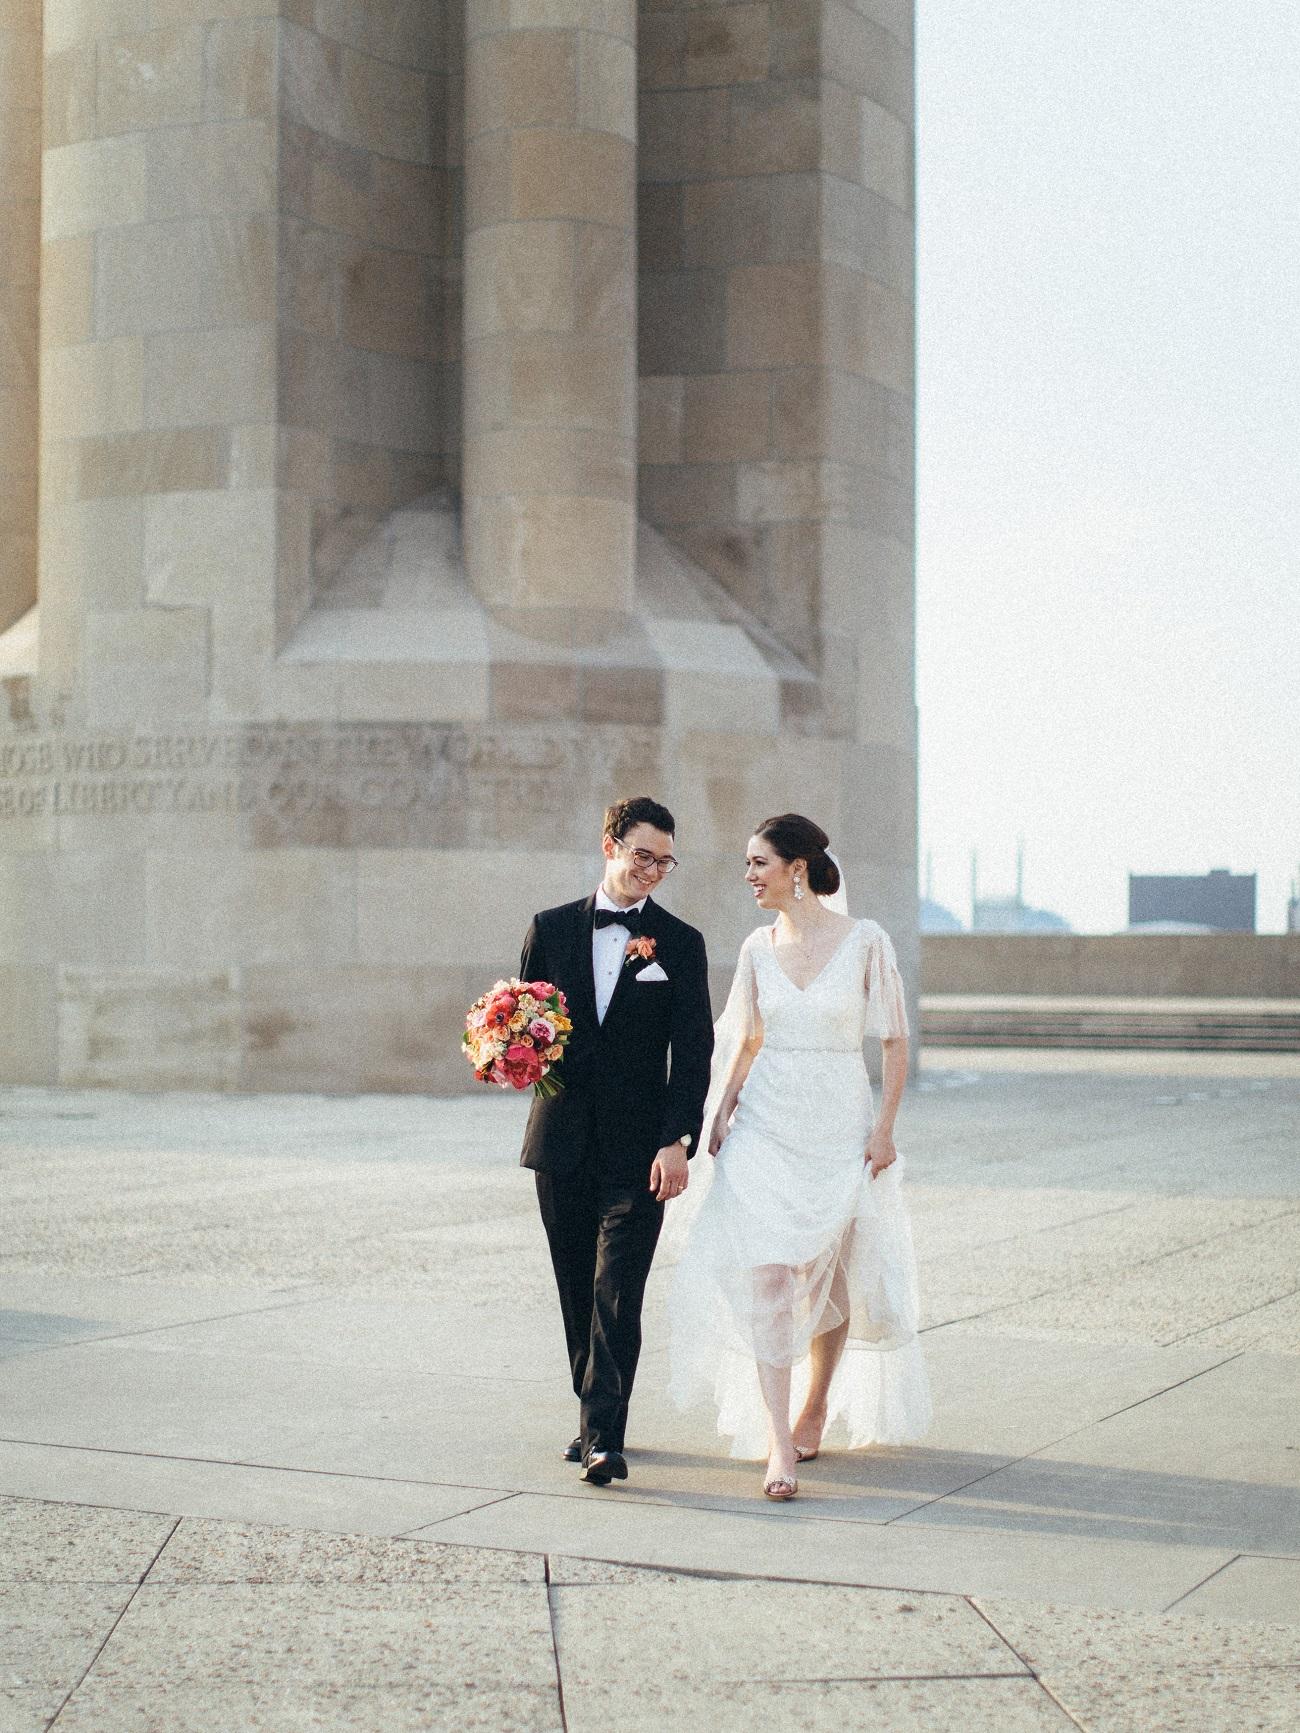 World War I Memorial Bride and Groom